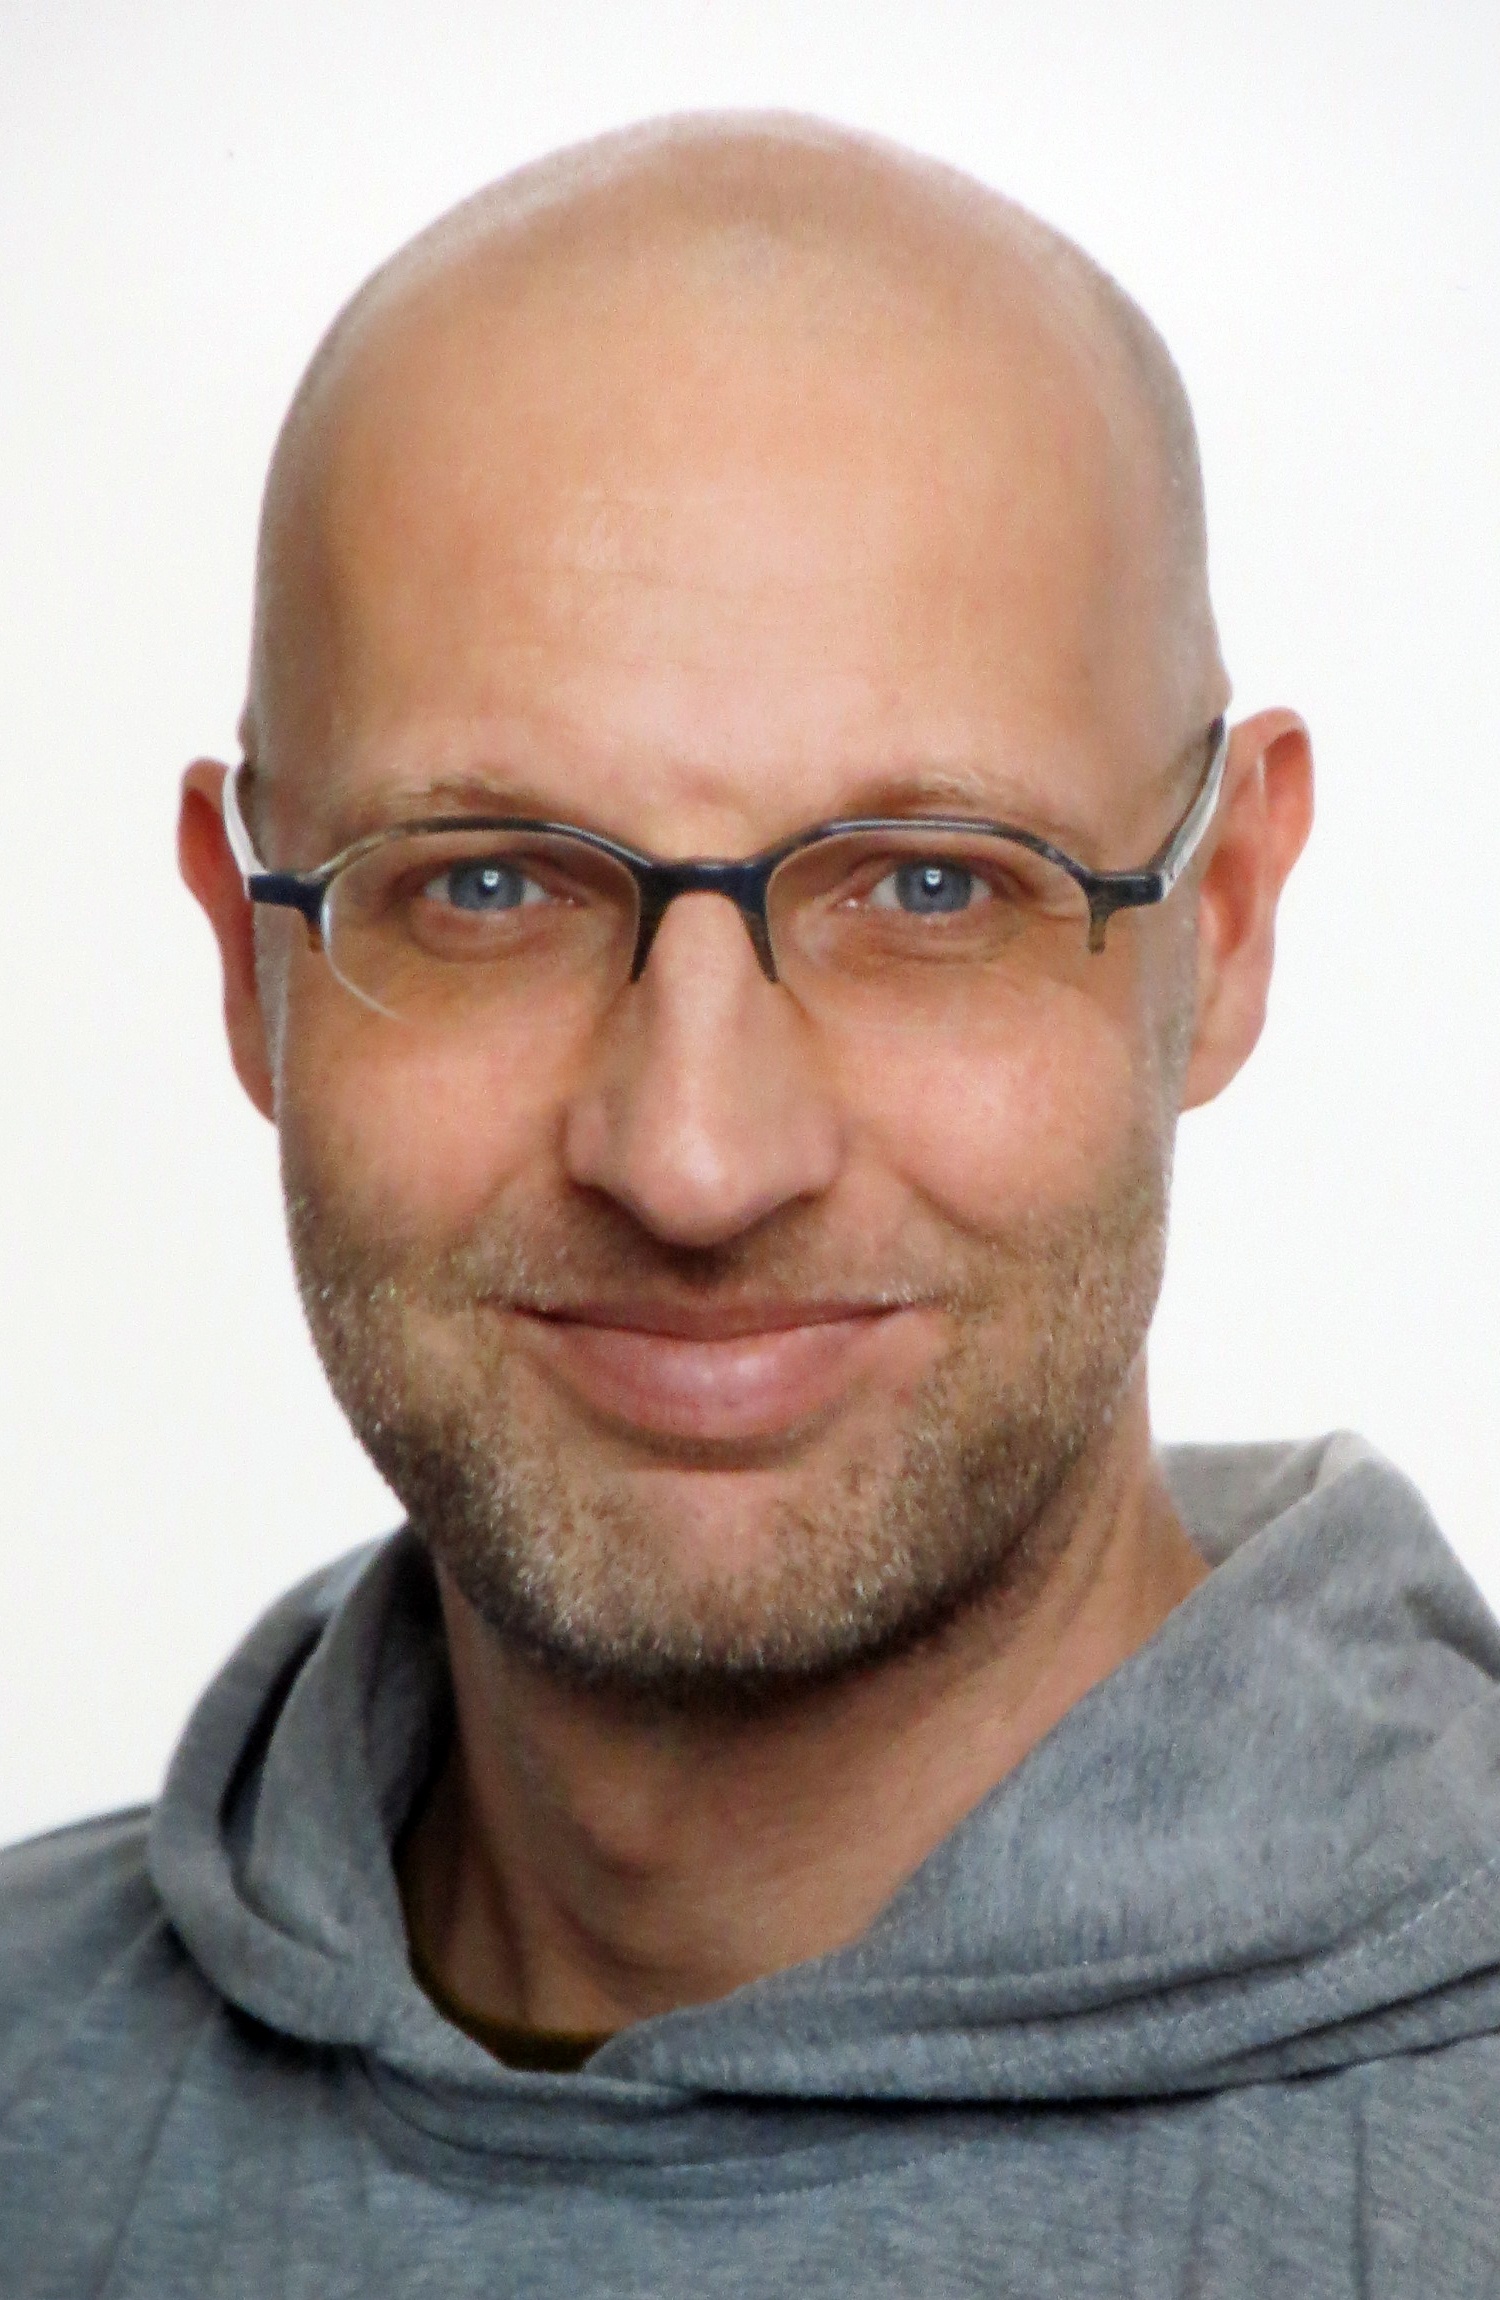 <b>Dirk Tannert</b> Shaolin Kempo- und Rollstuhlkarate-Trainer - Portrait_02_15